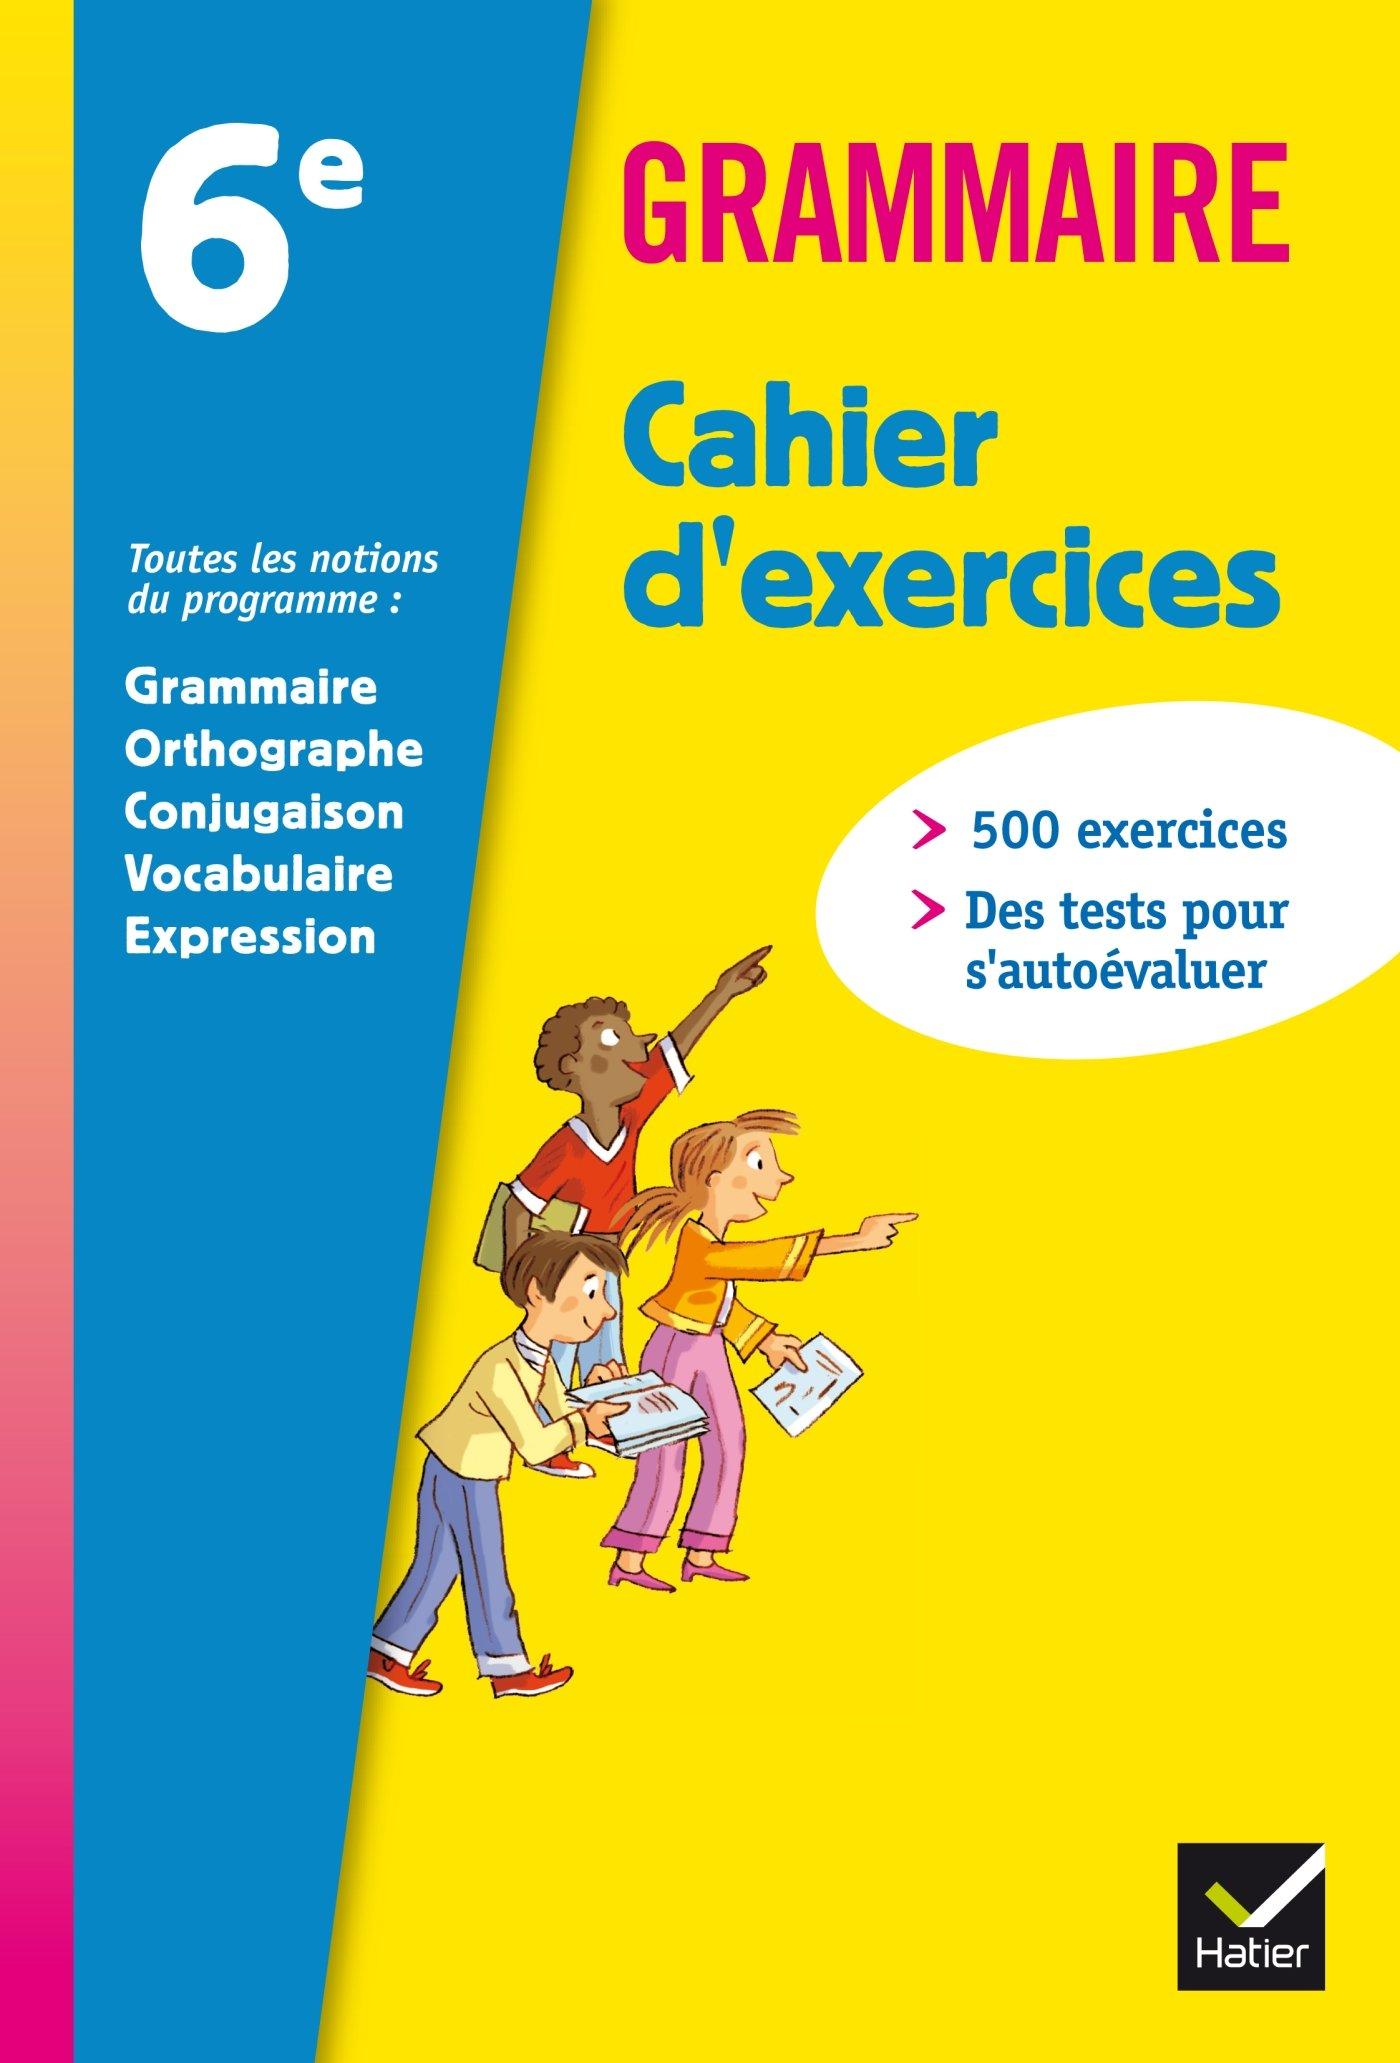 Grammaire Francais 6eme Cahier D Exercices Edit 2011 Lomne Annie 9782218946332 Textbooks Amazon Canada